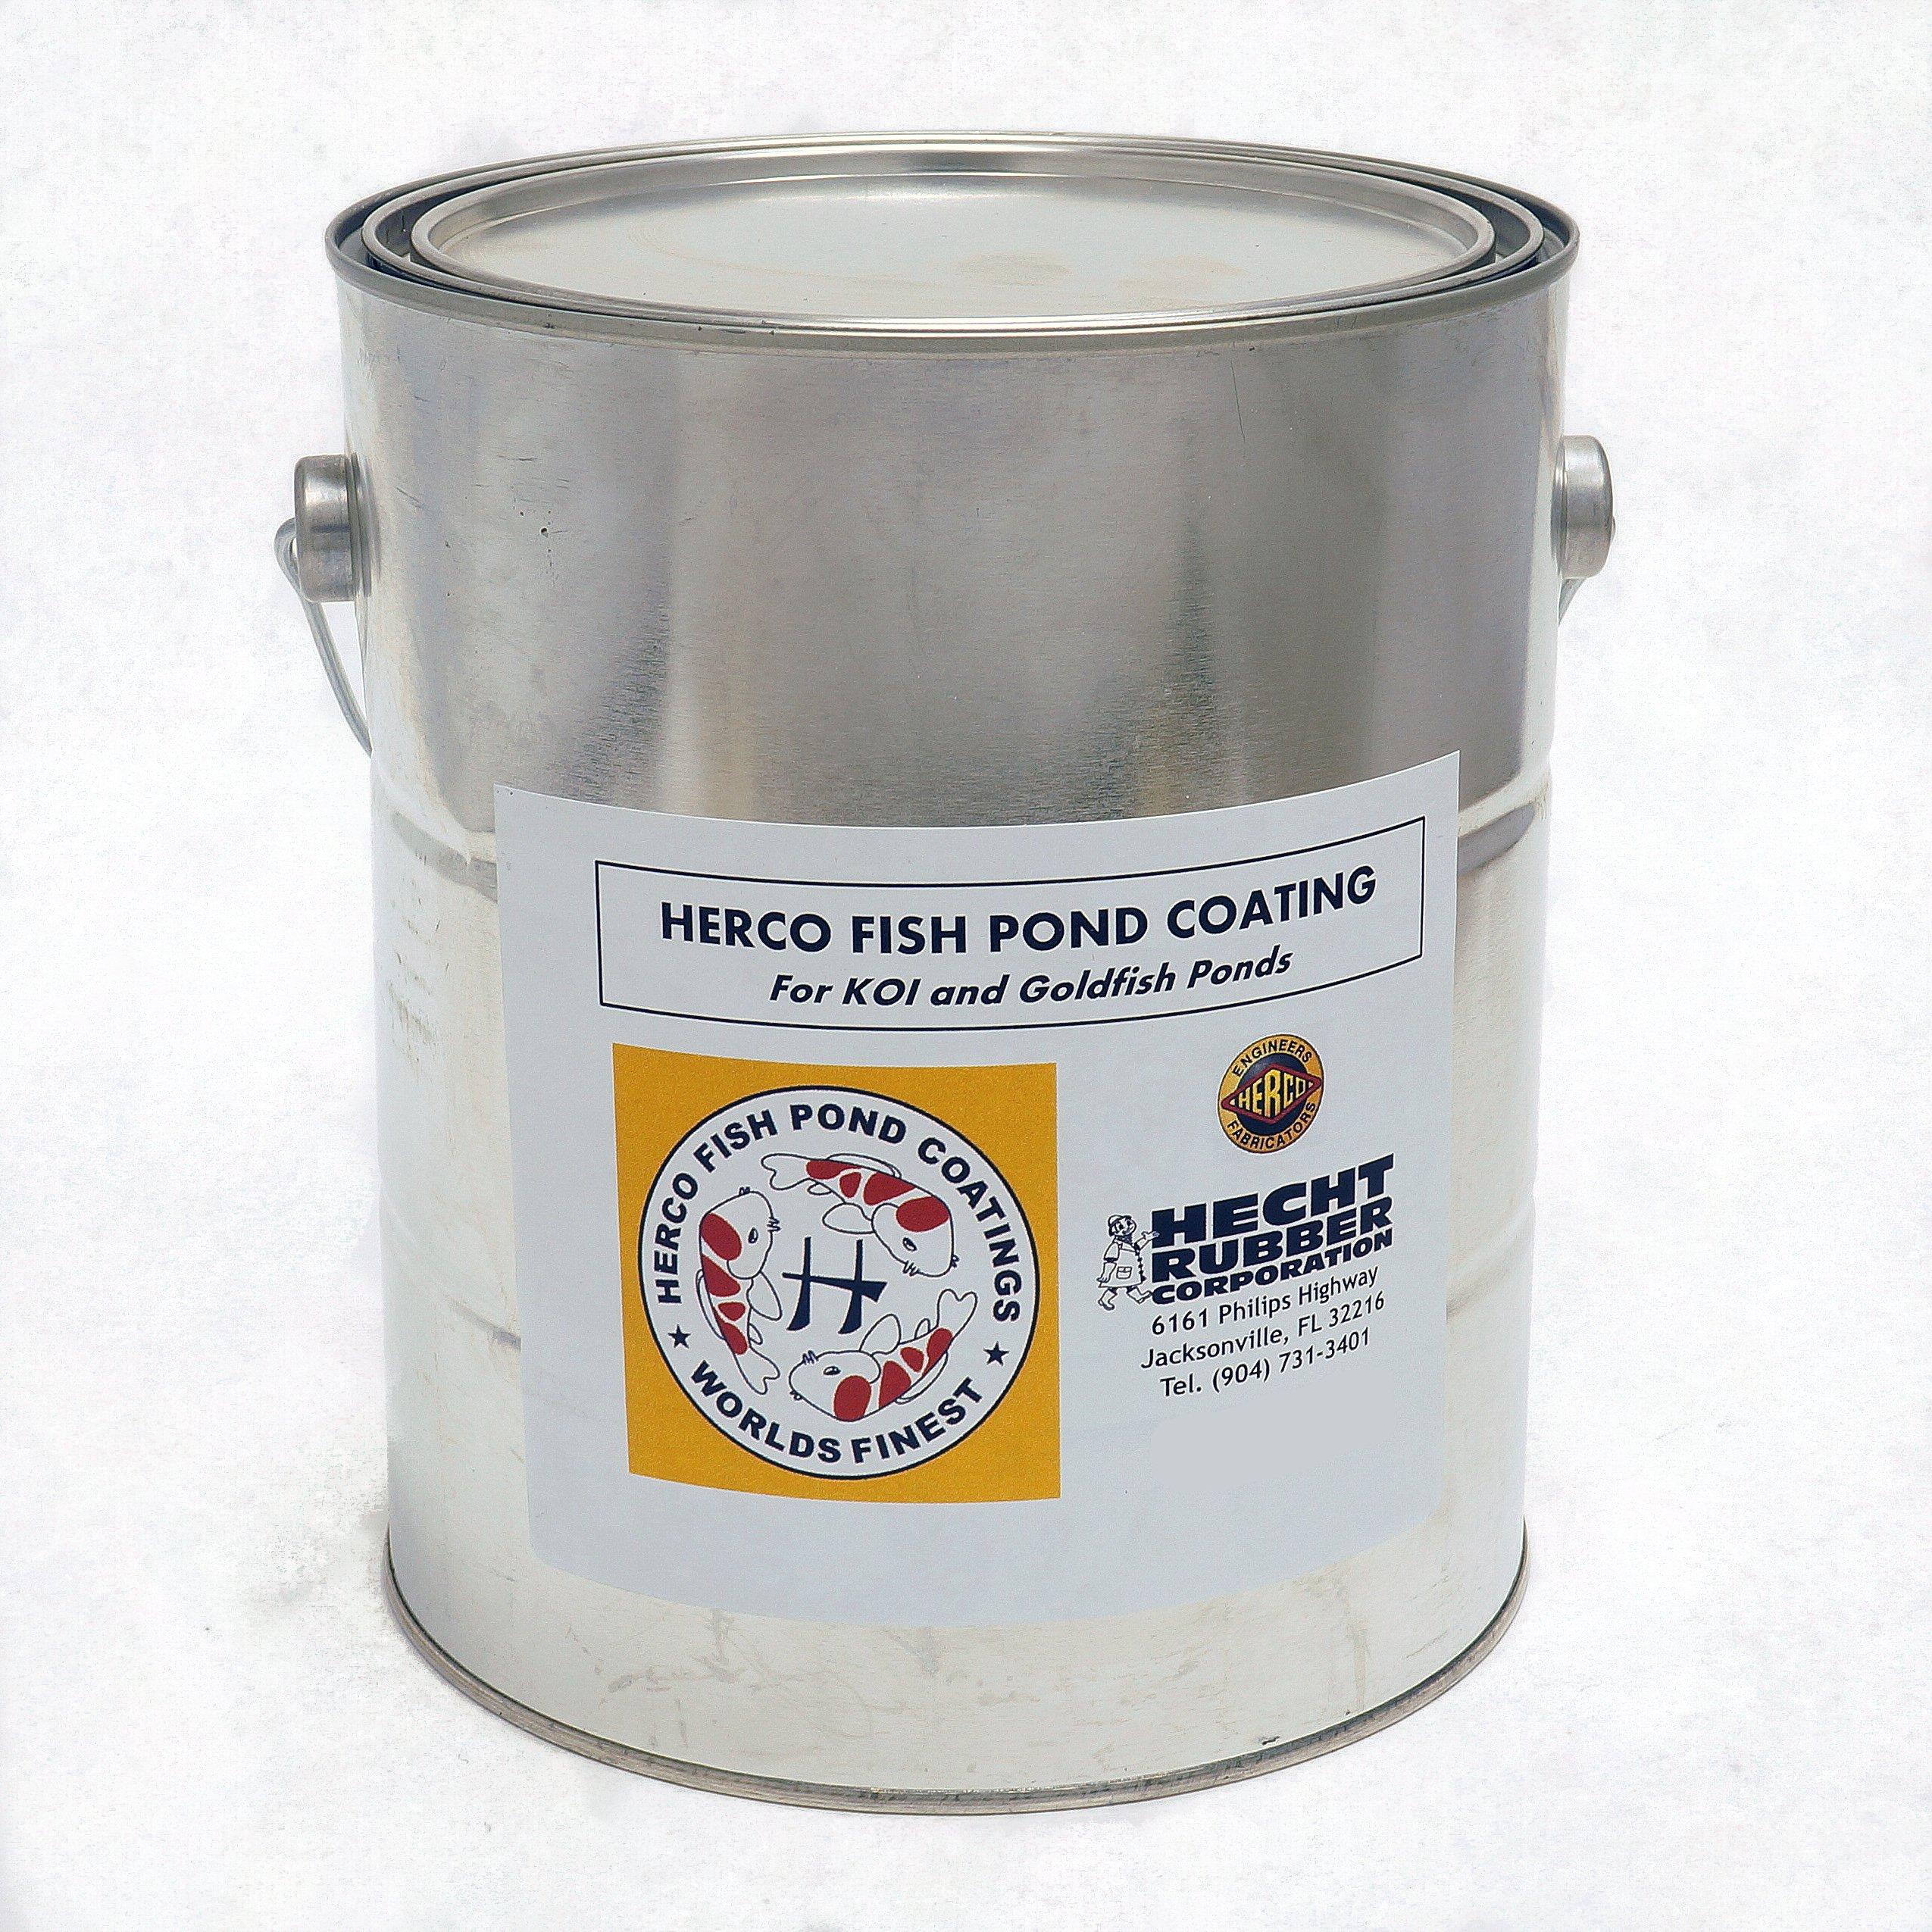 Herco H-55 Pond Coating - One Gallon - Black